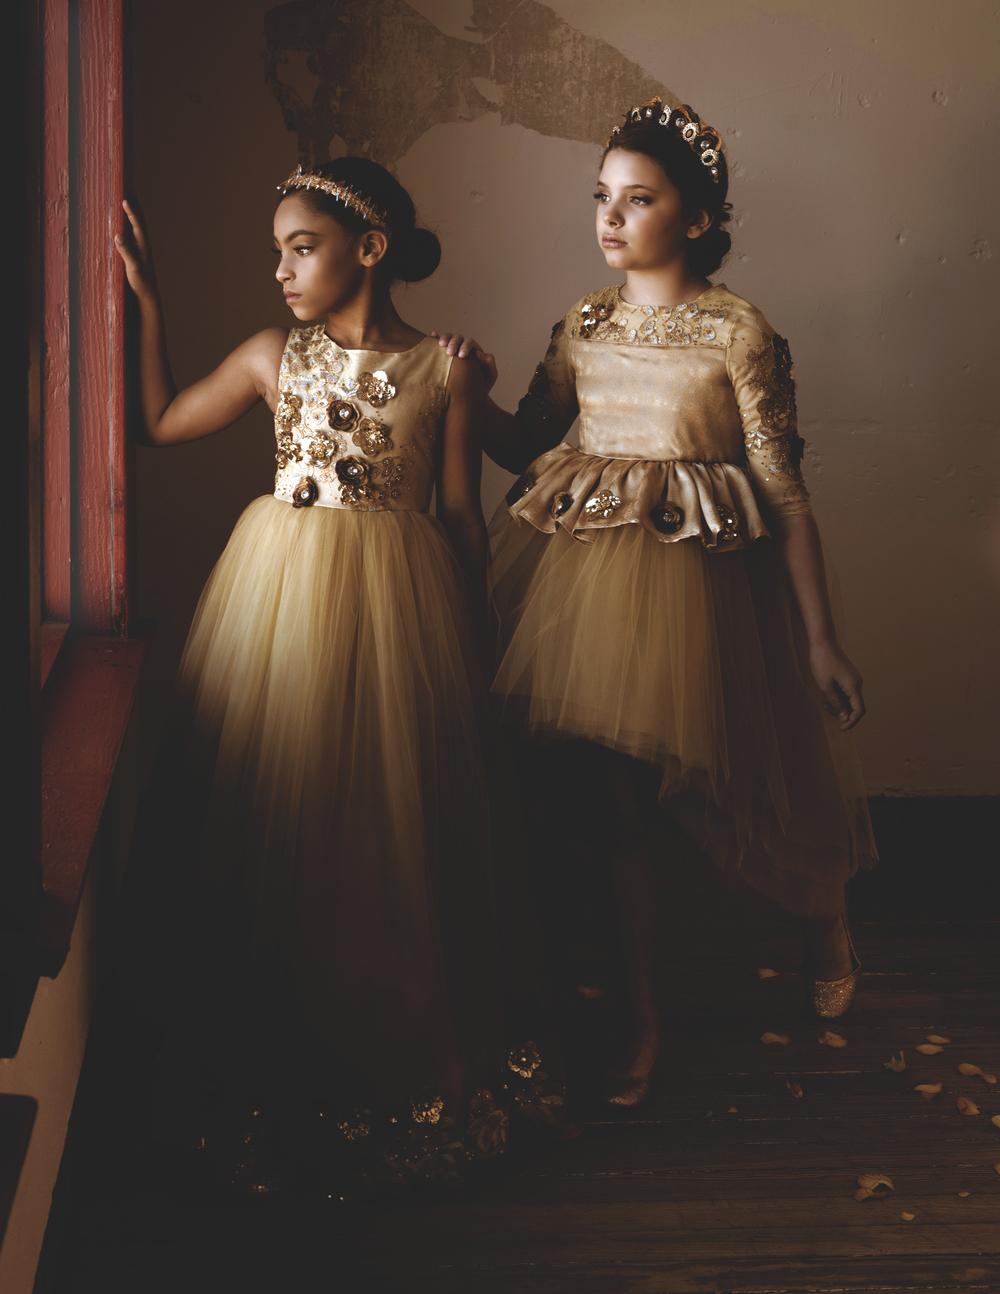 Edward-Franco-Photography-Loren-Franco-Designs-7493-2fb.jpg